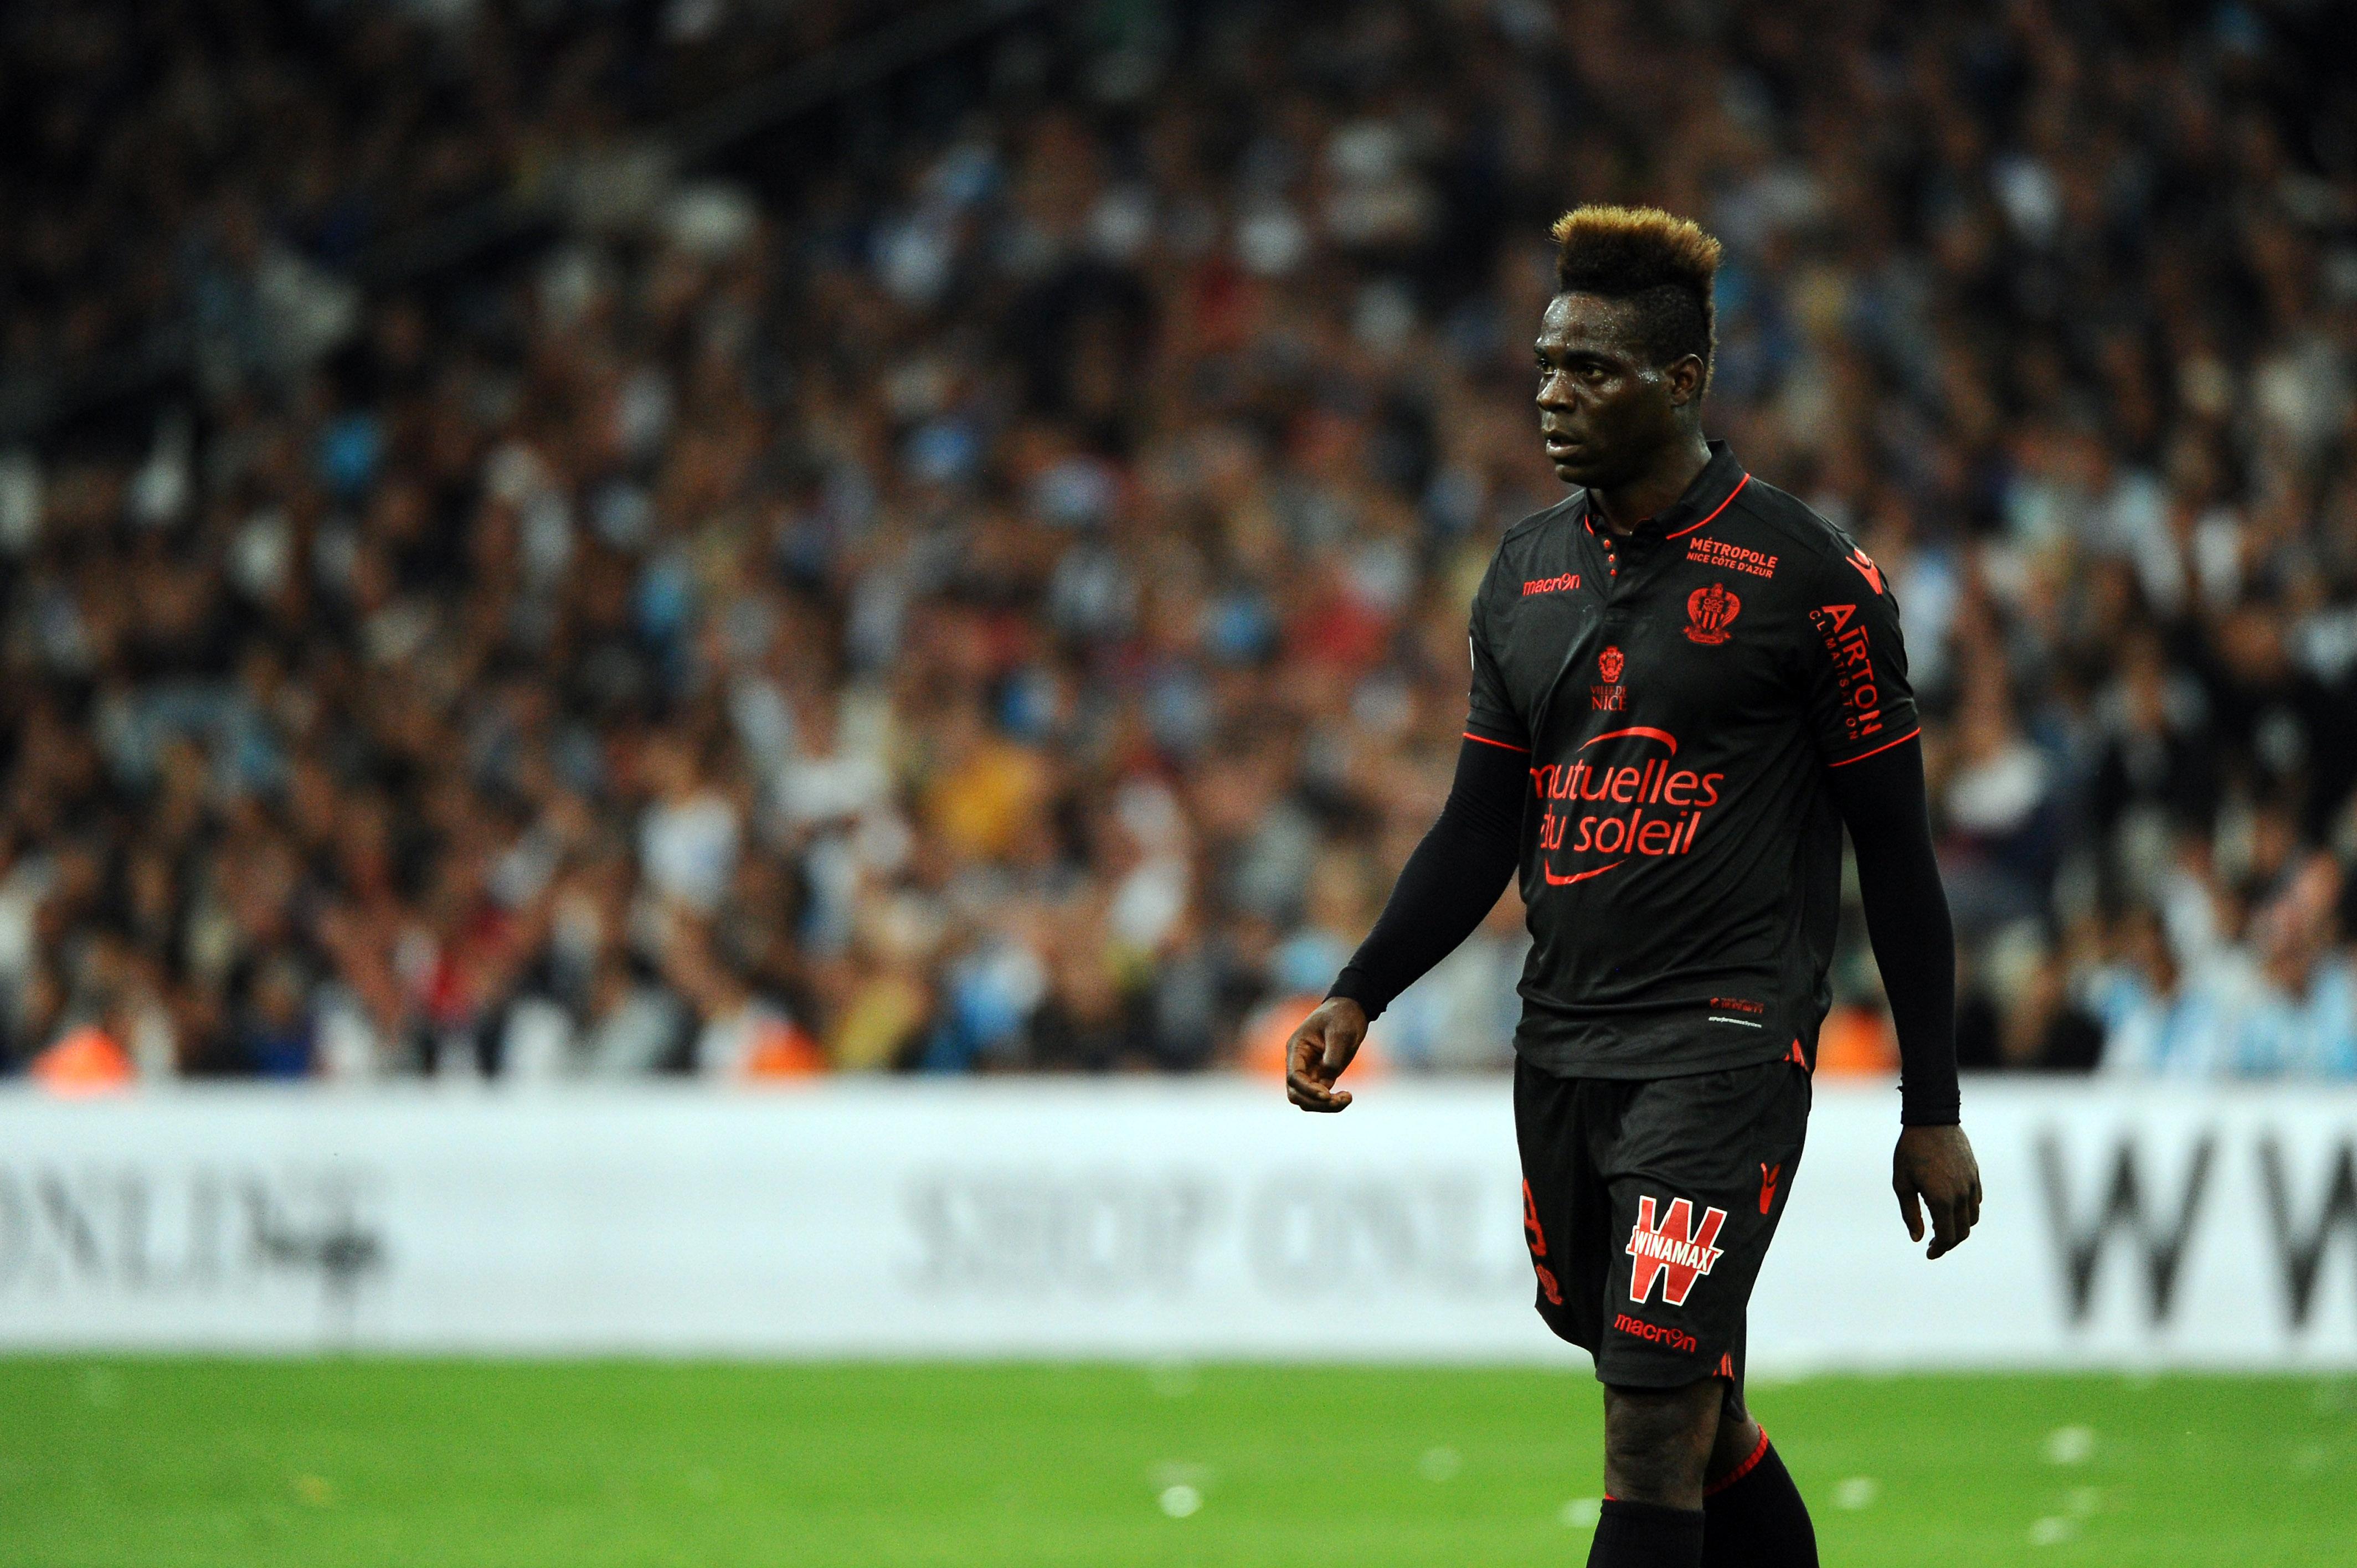 Football - Transferts - Et si la future star de l'OM s'appelait … Balotelli ?